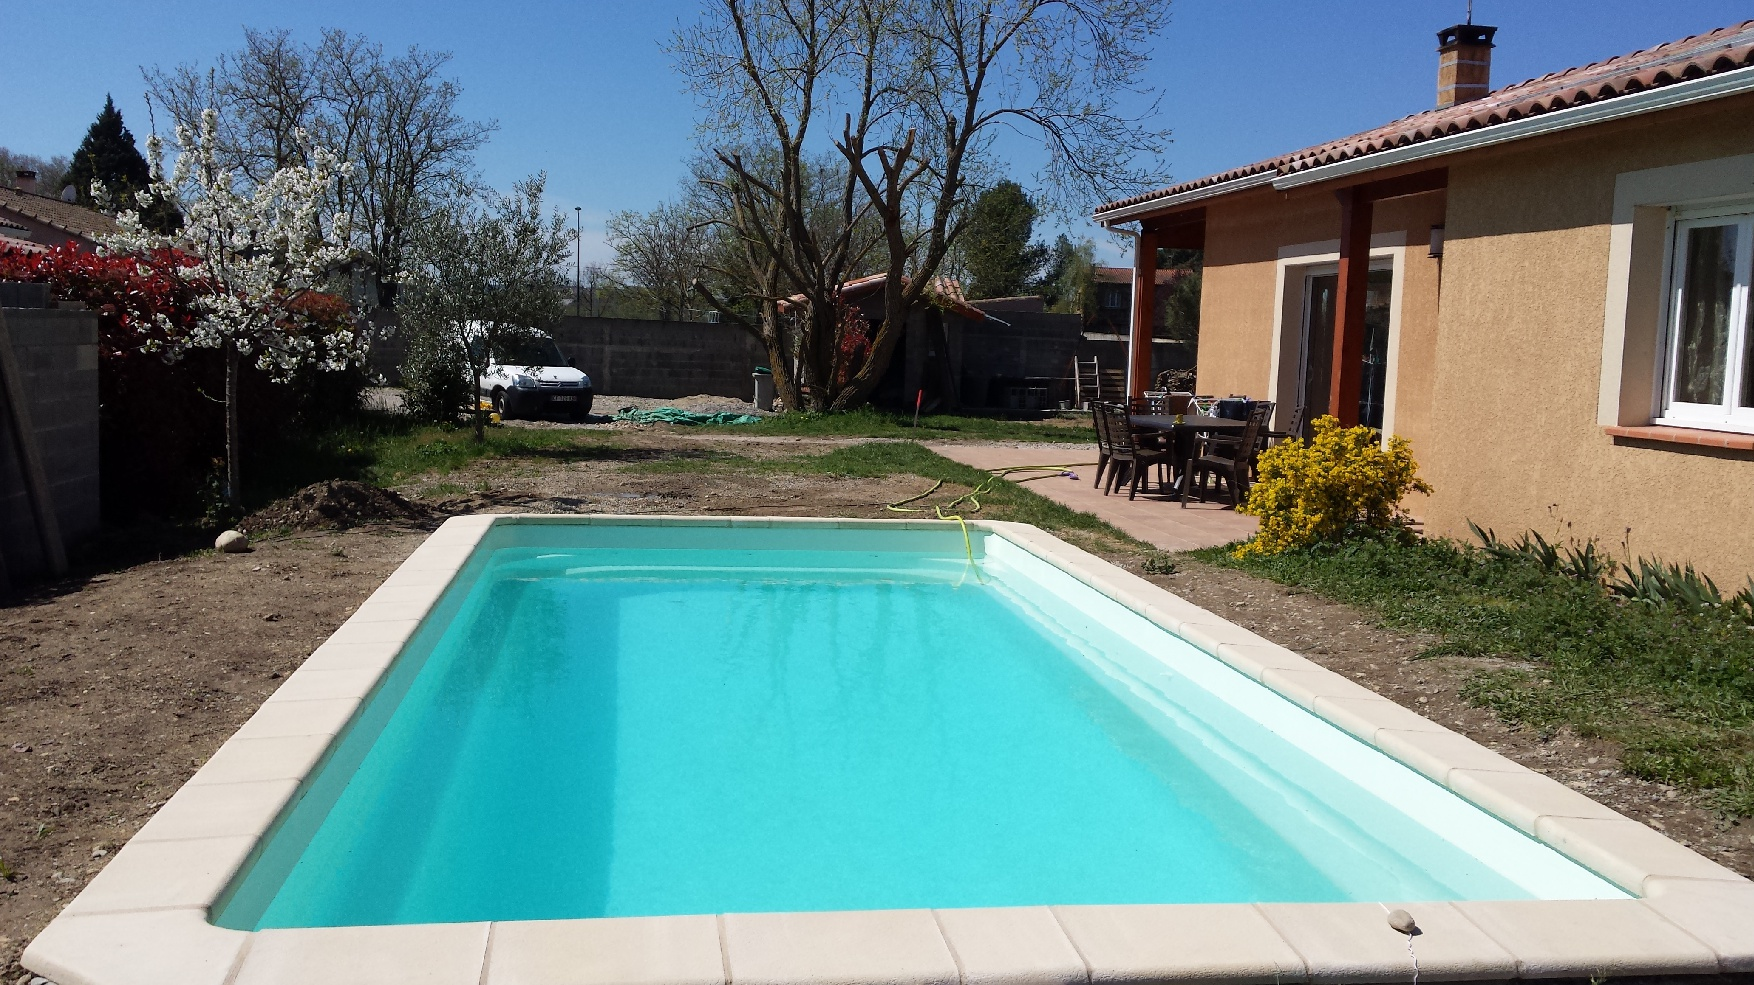 Installation terrassement d'une piscine coque polyester à Auterive 31190 Haute Garonne